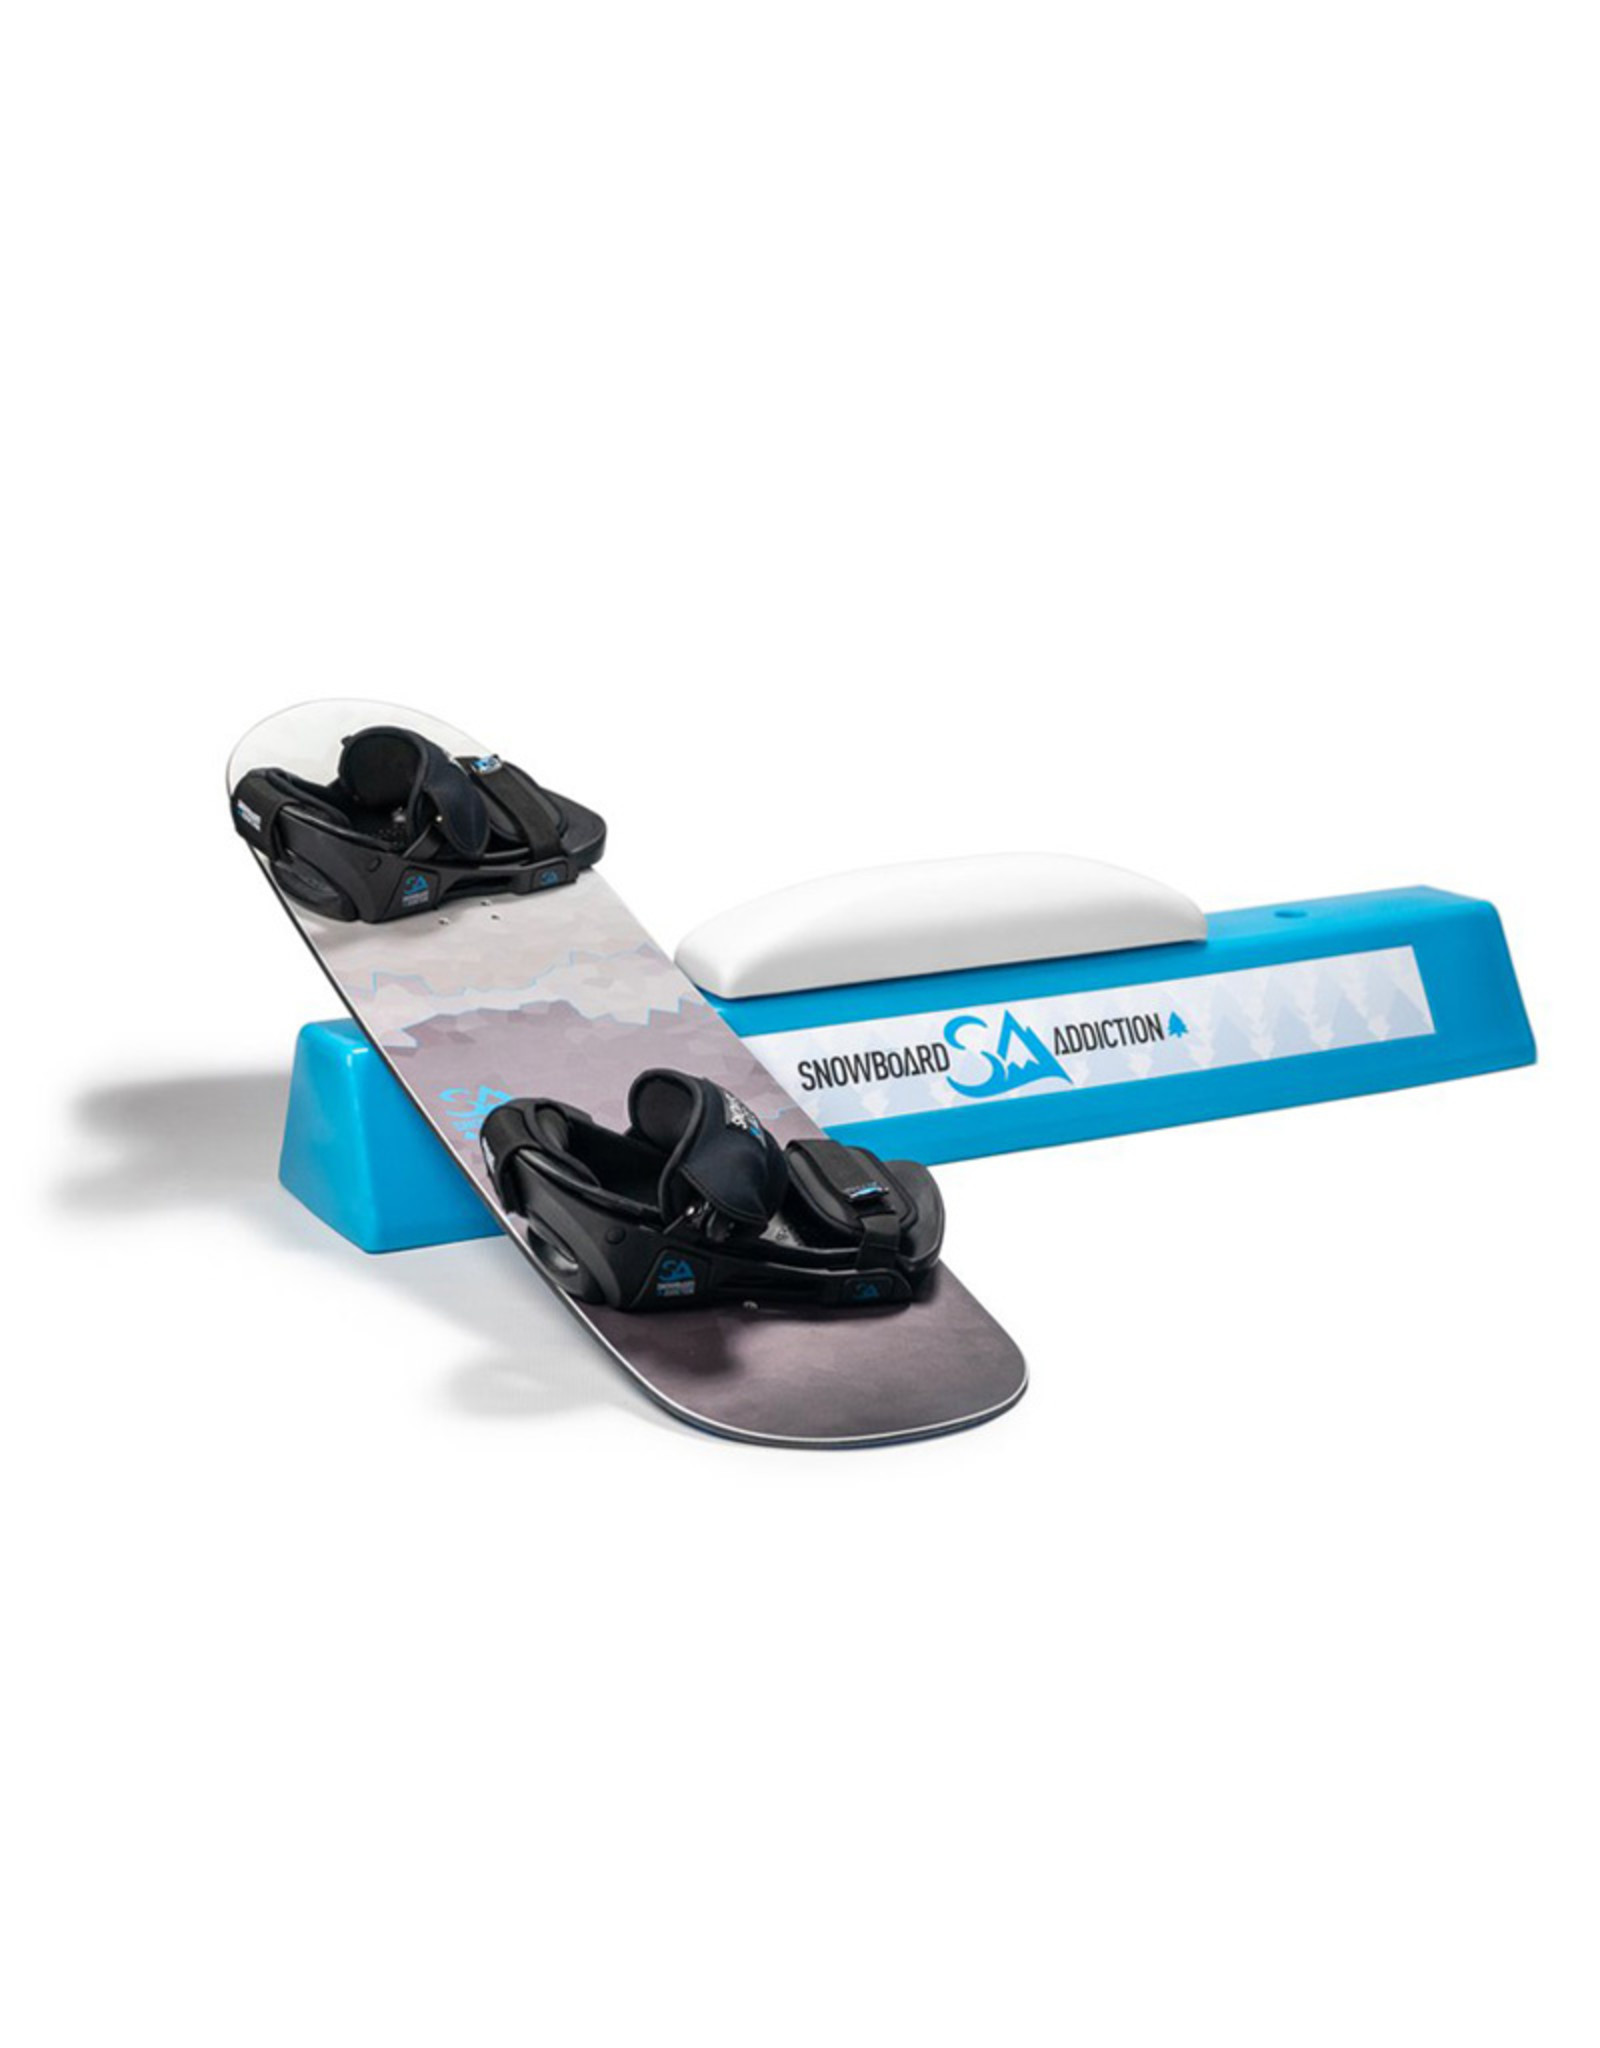 Snowboard Addiction Snowboard Addiction Jib Training Setup